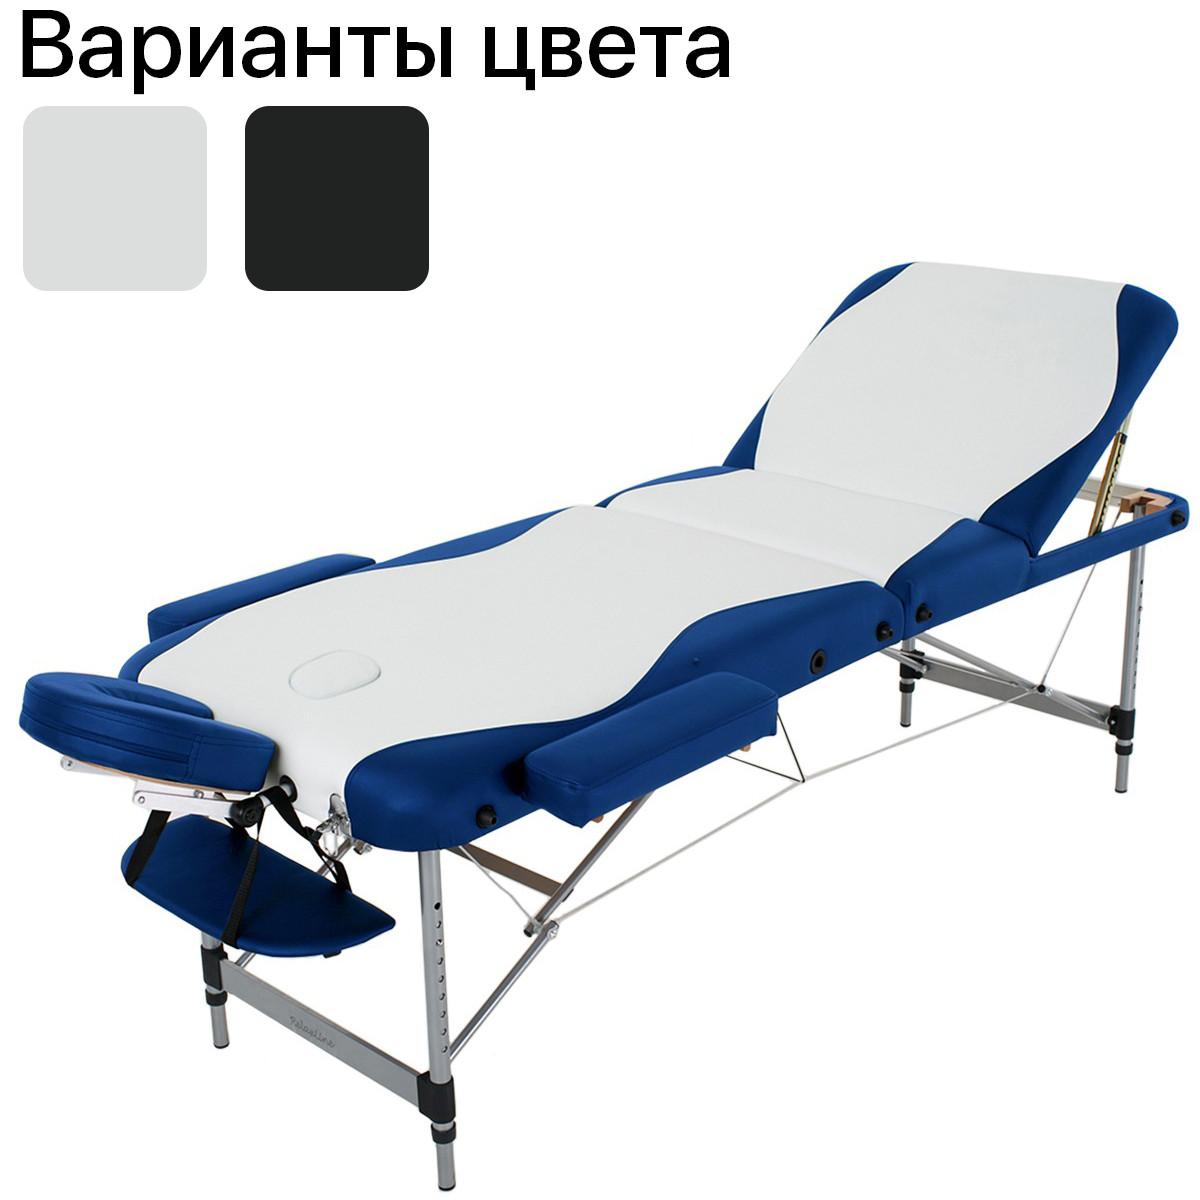 Массажный стол алюминиевый 3-х сегментный RelaxLine King кушетка массажная для массажа